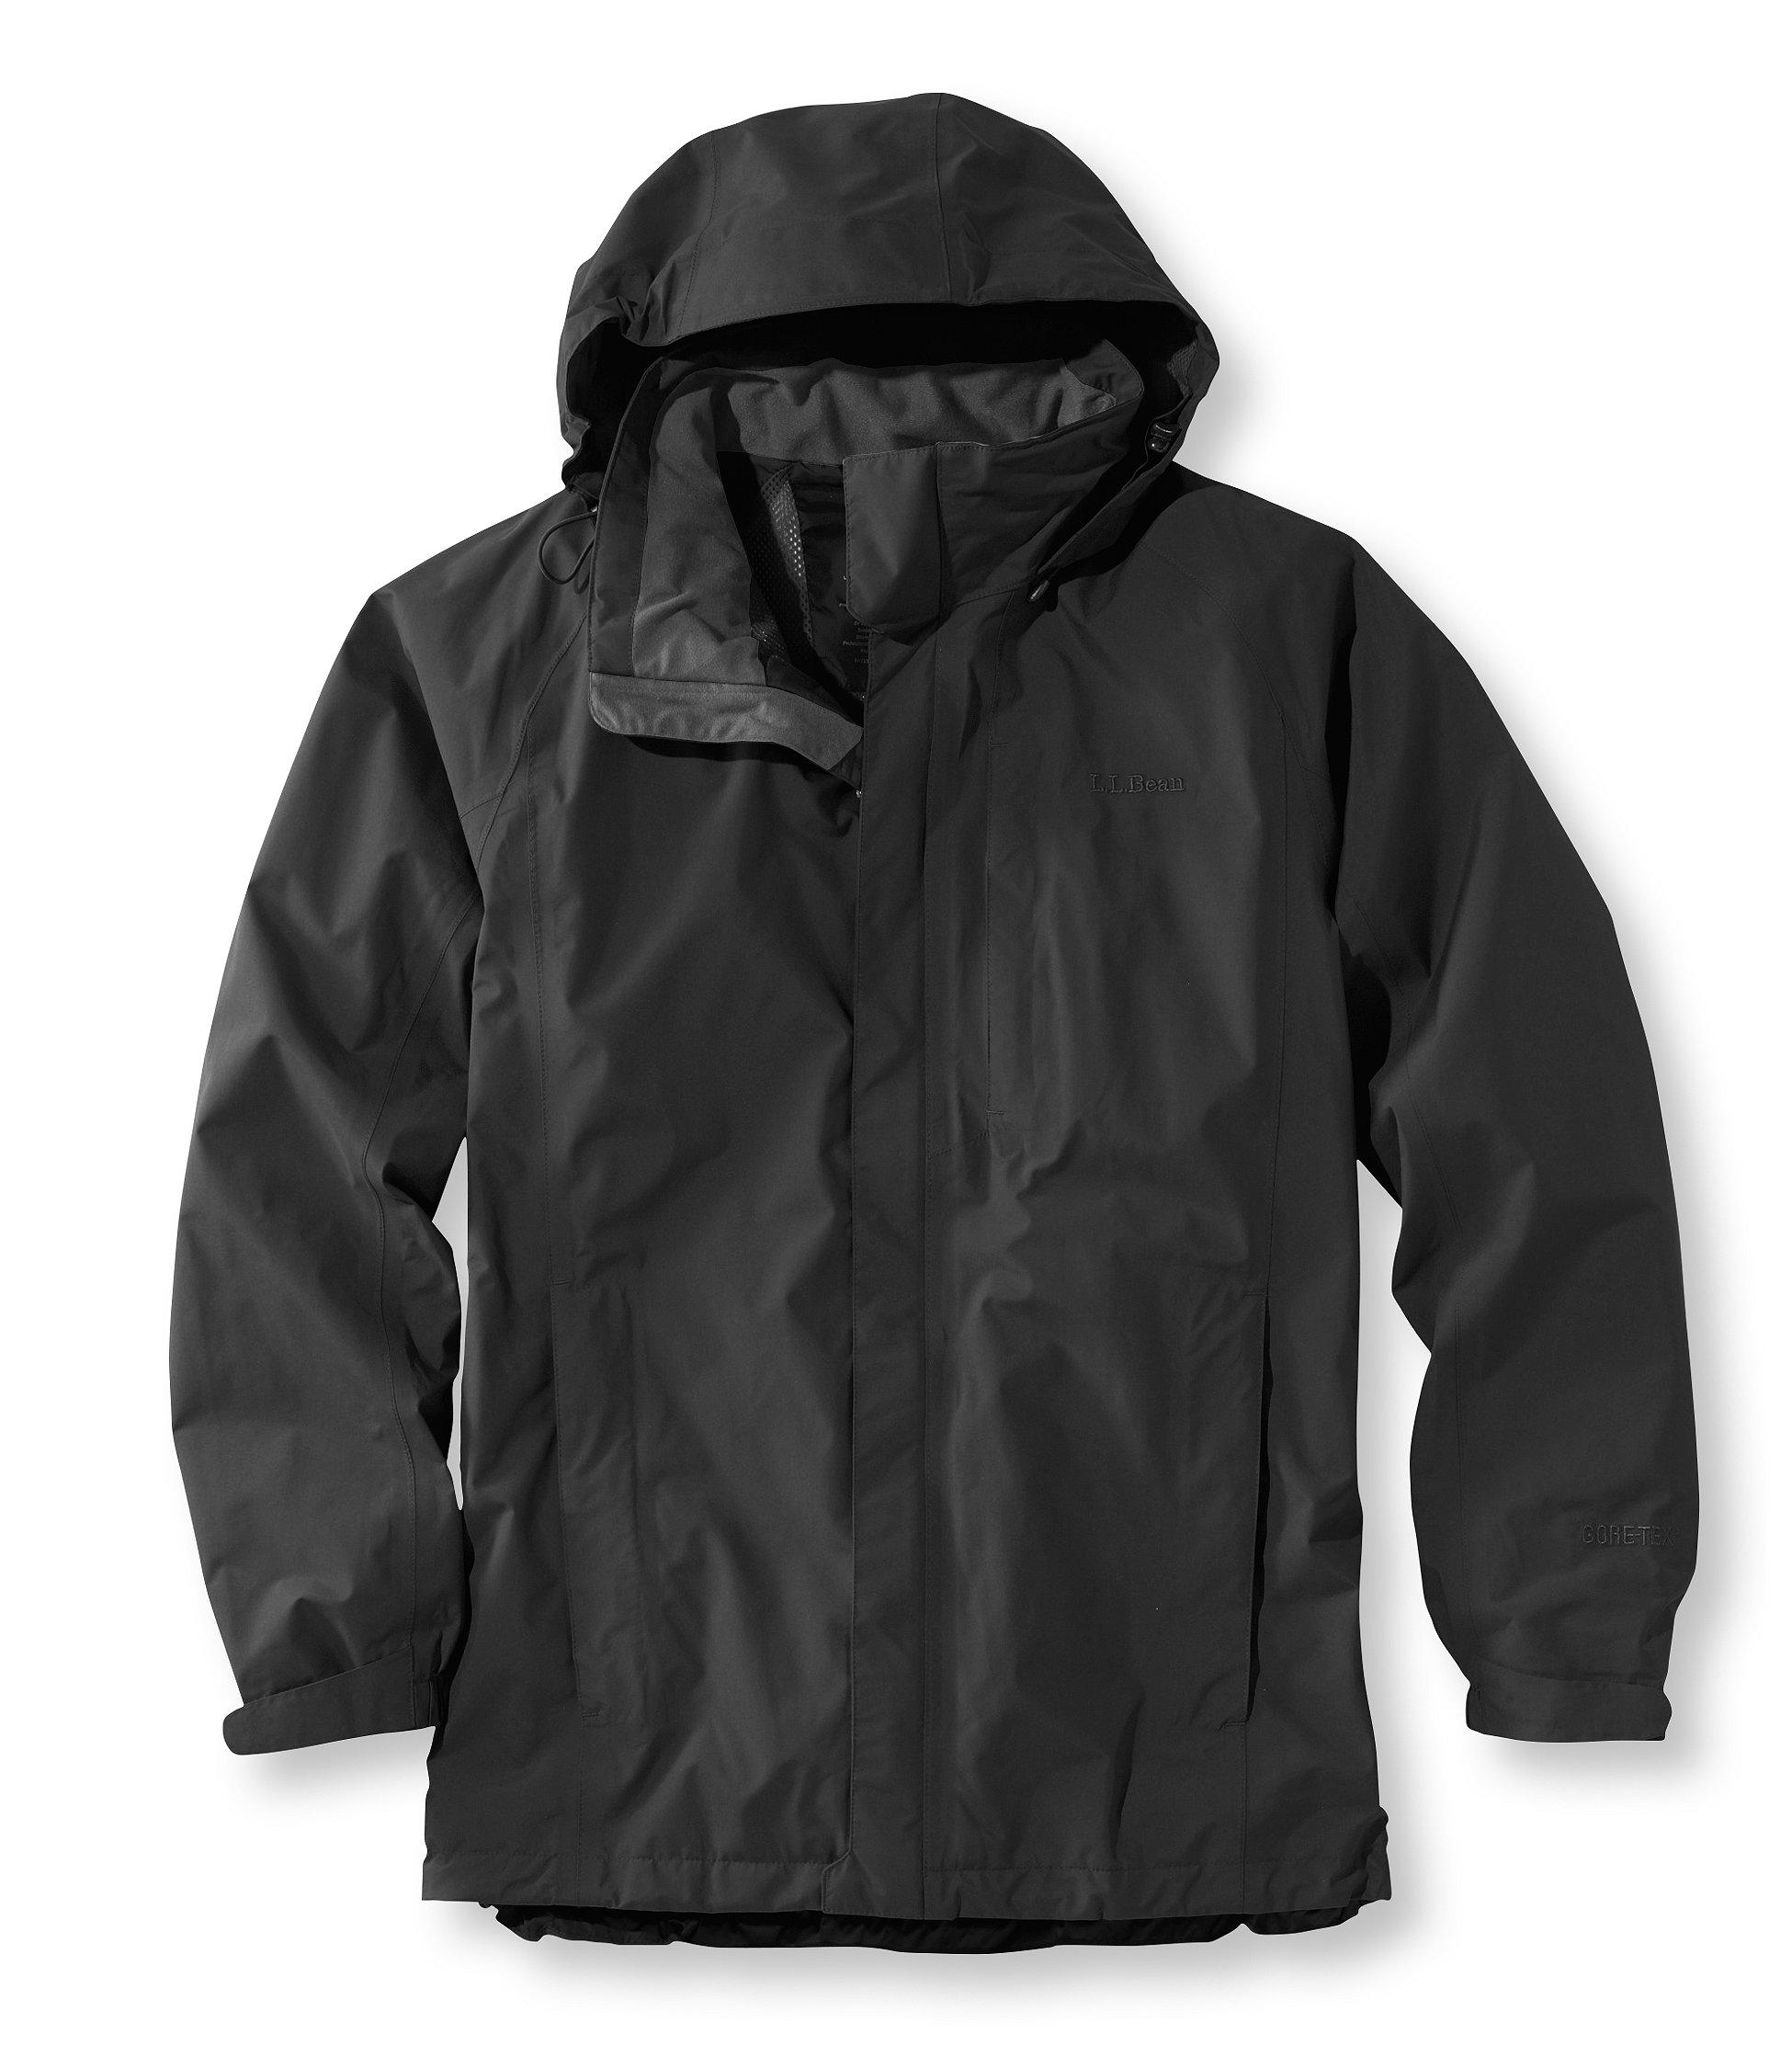 photo: L.L.Bean Stowaway Jacket With Gore-Tex waterproof jacket